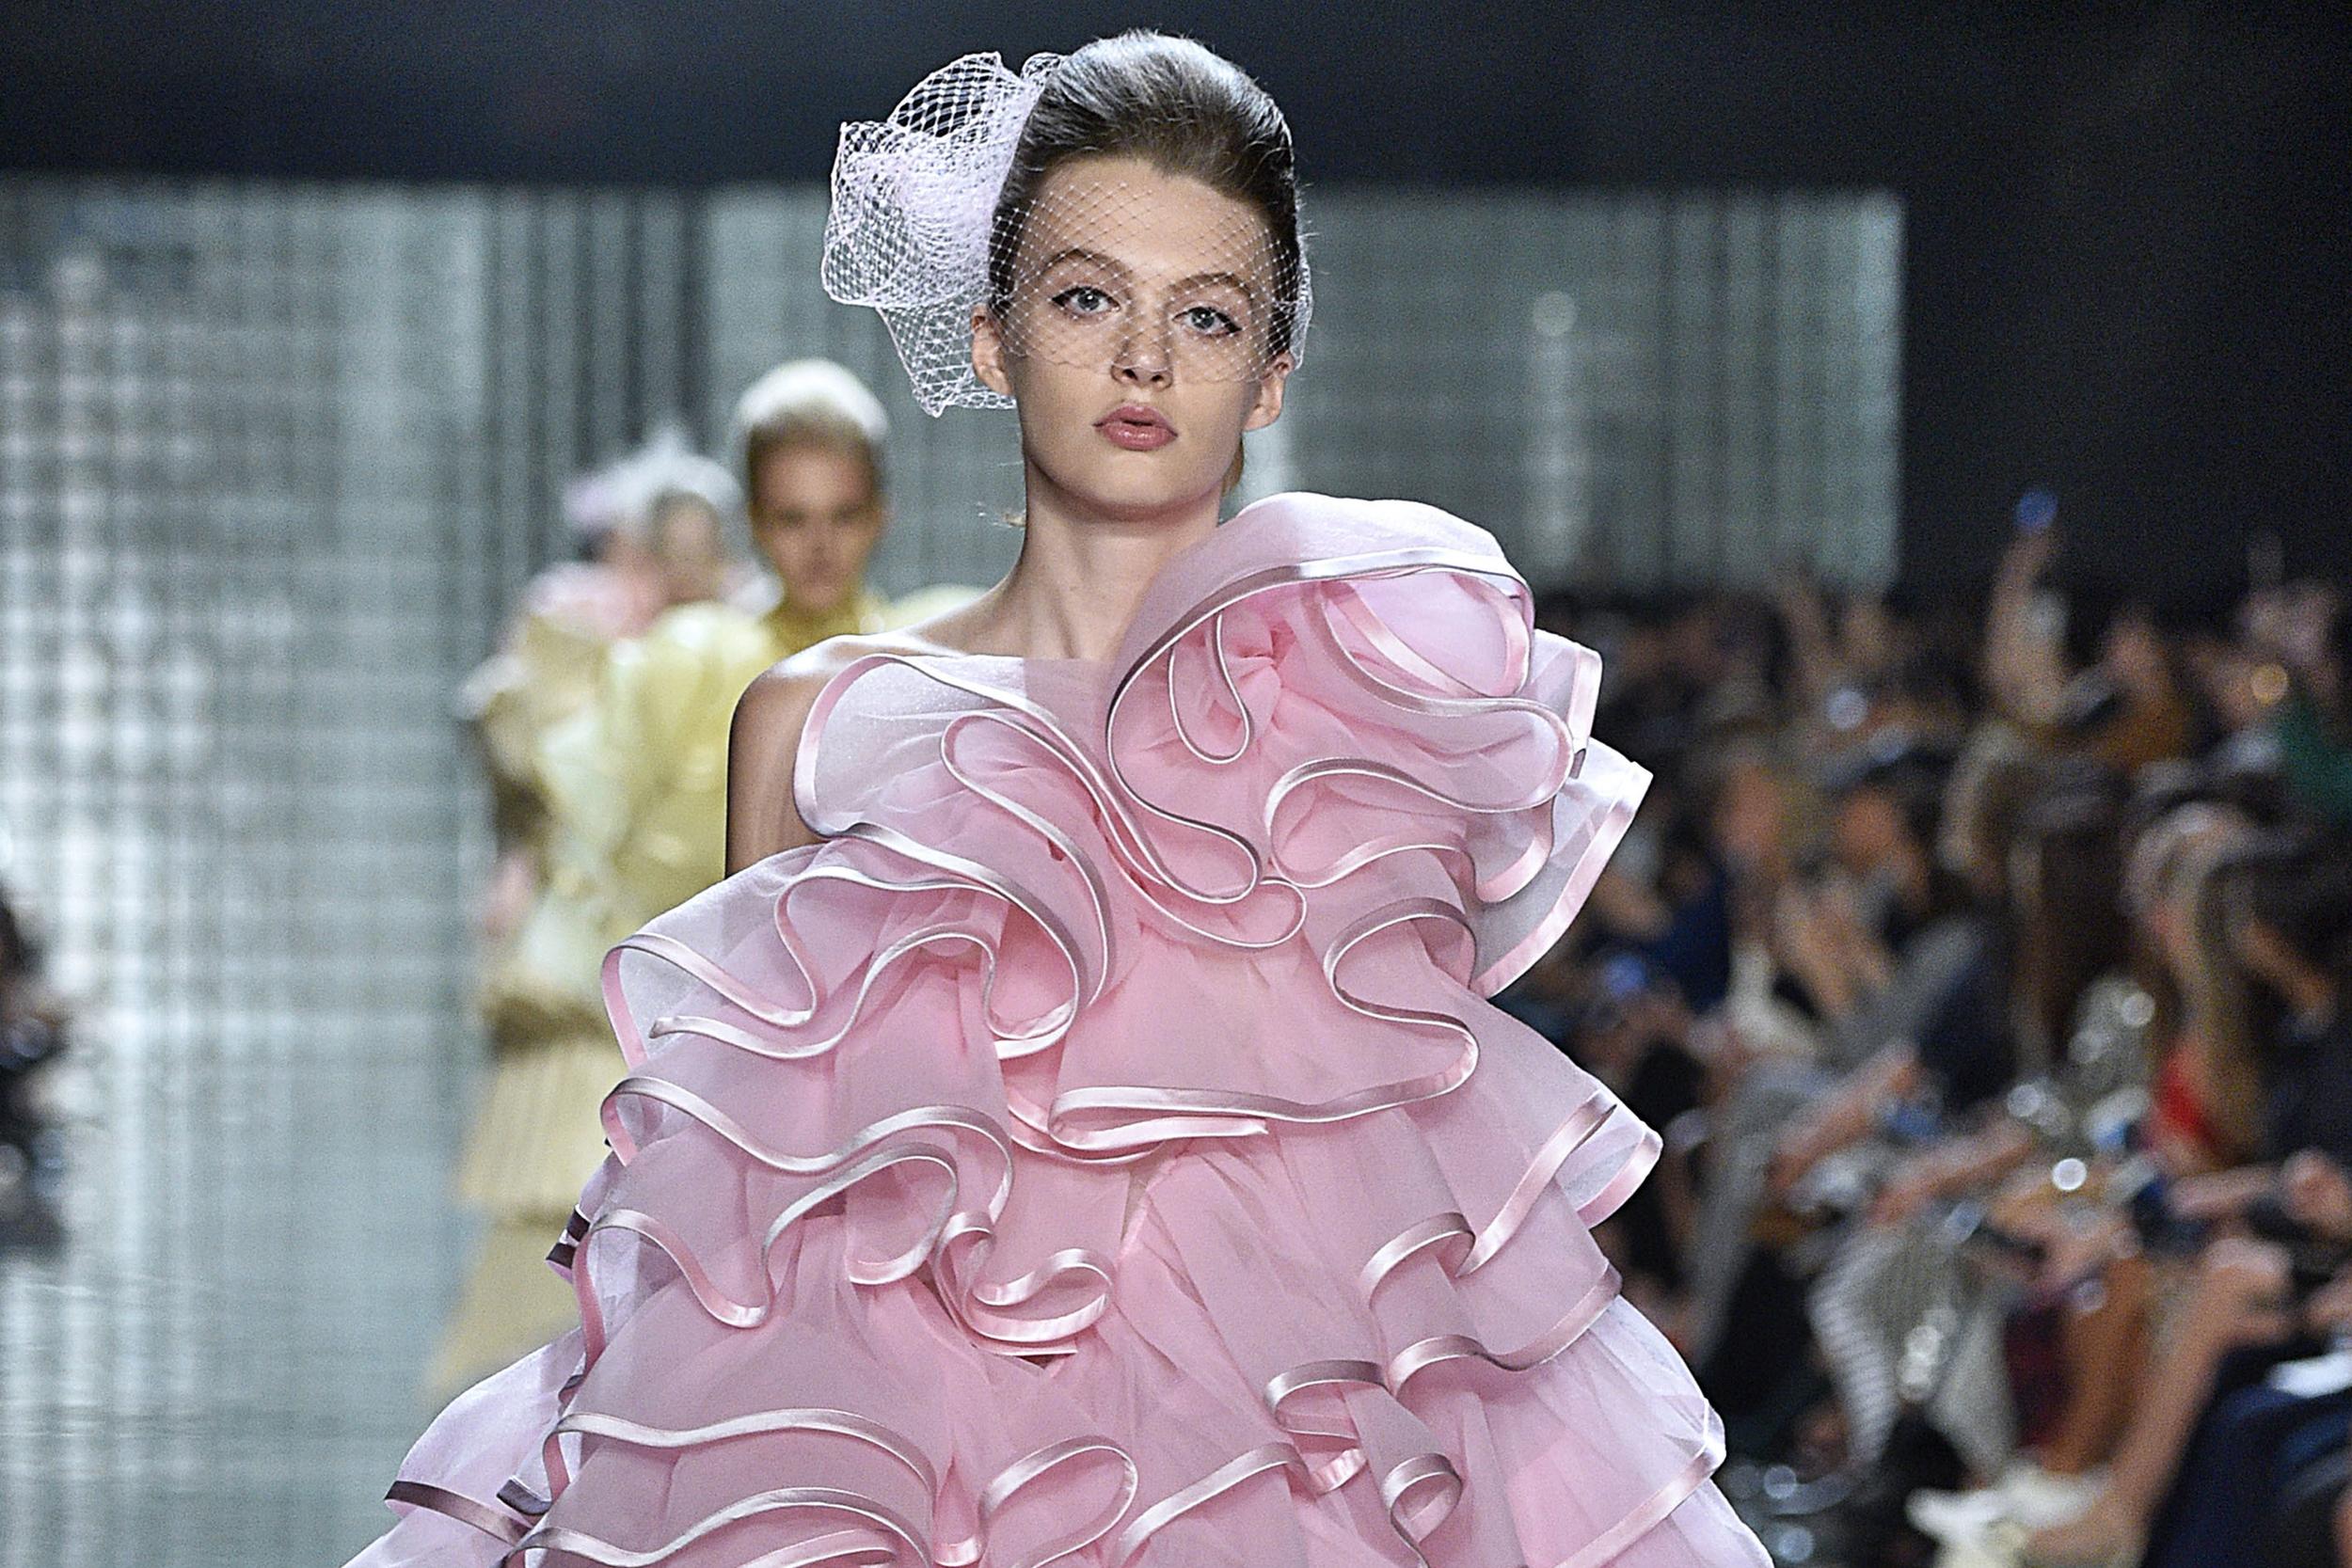 Ariel Nicholson is U.S. Vogue's first transgender cover model